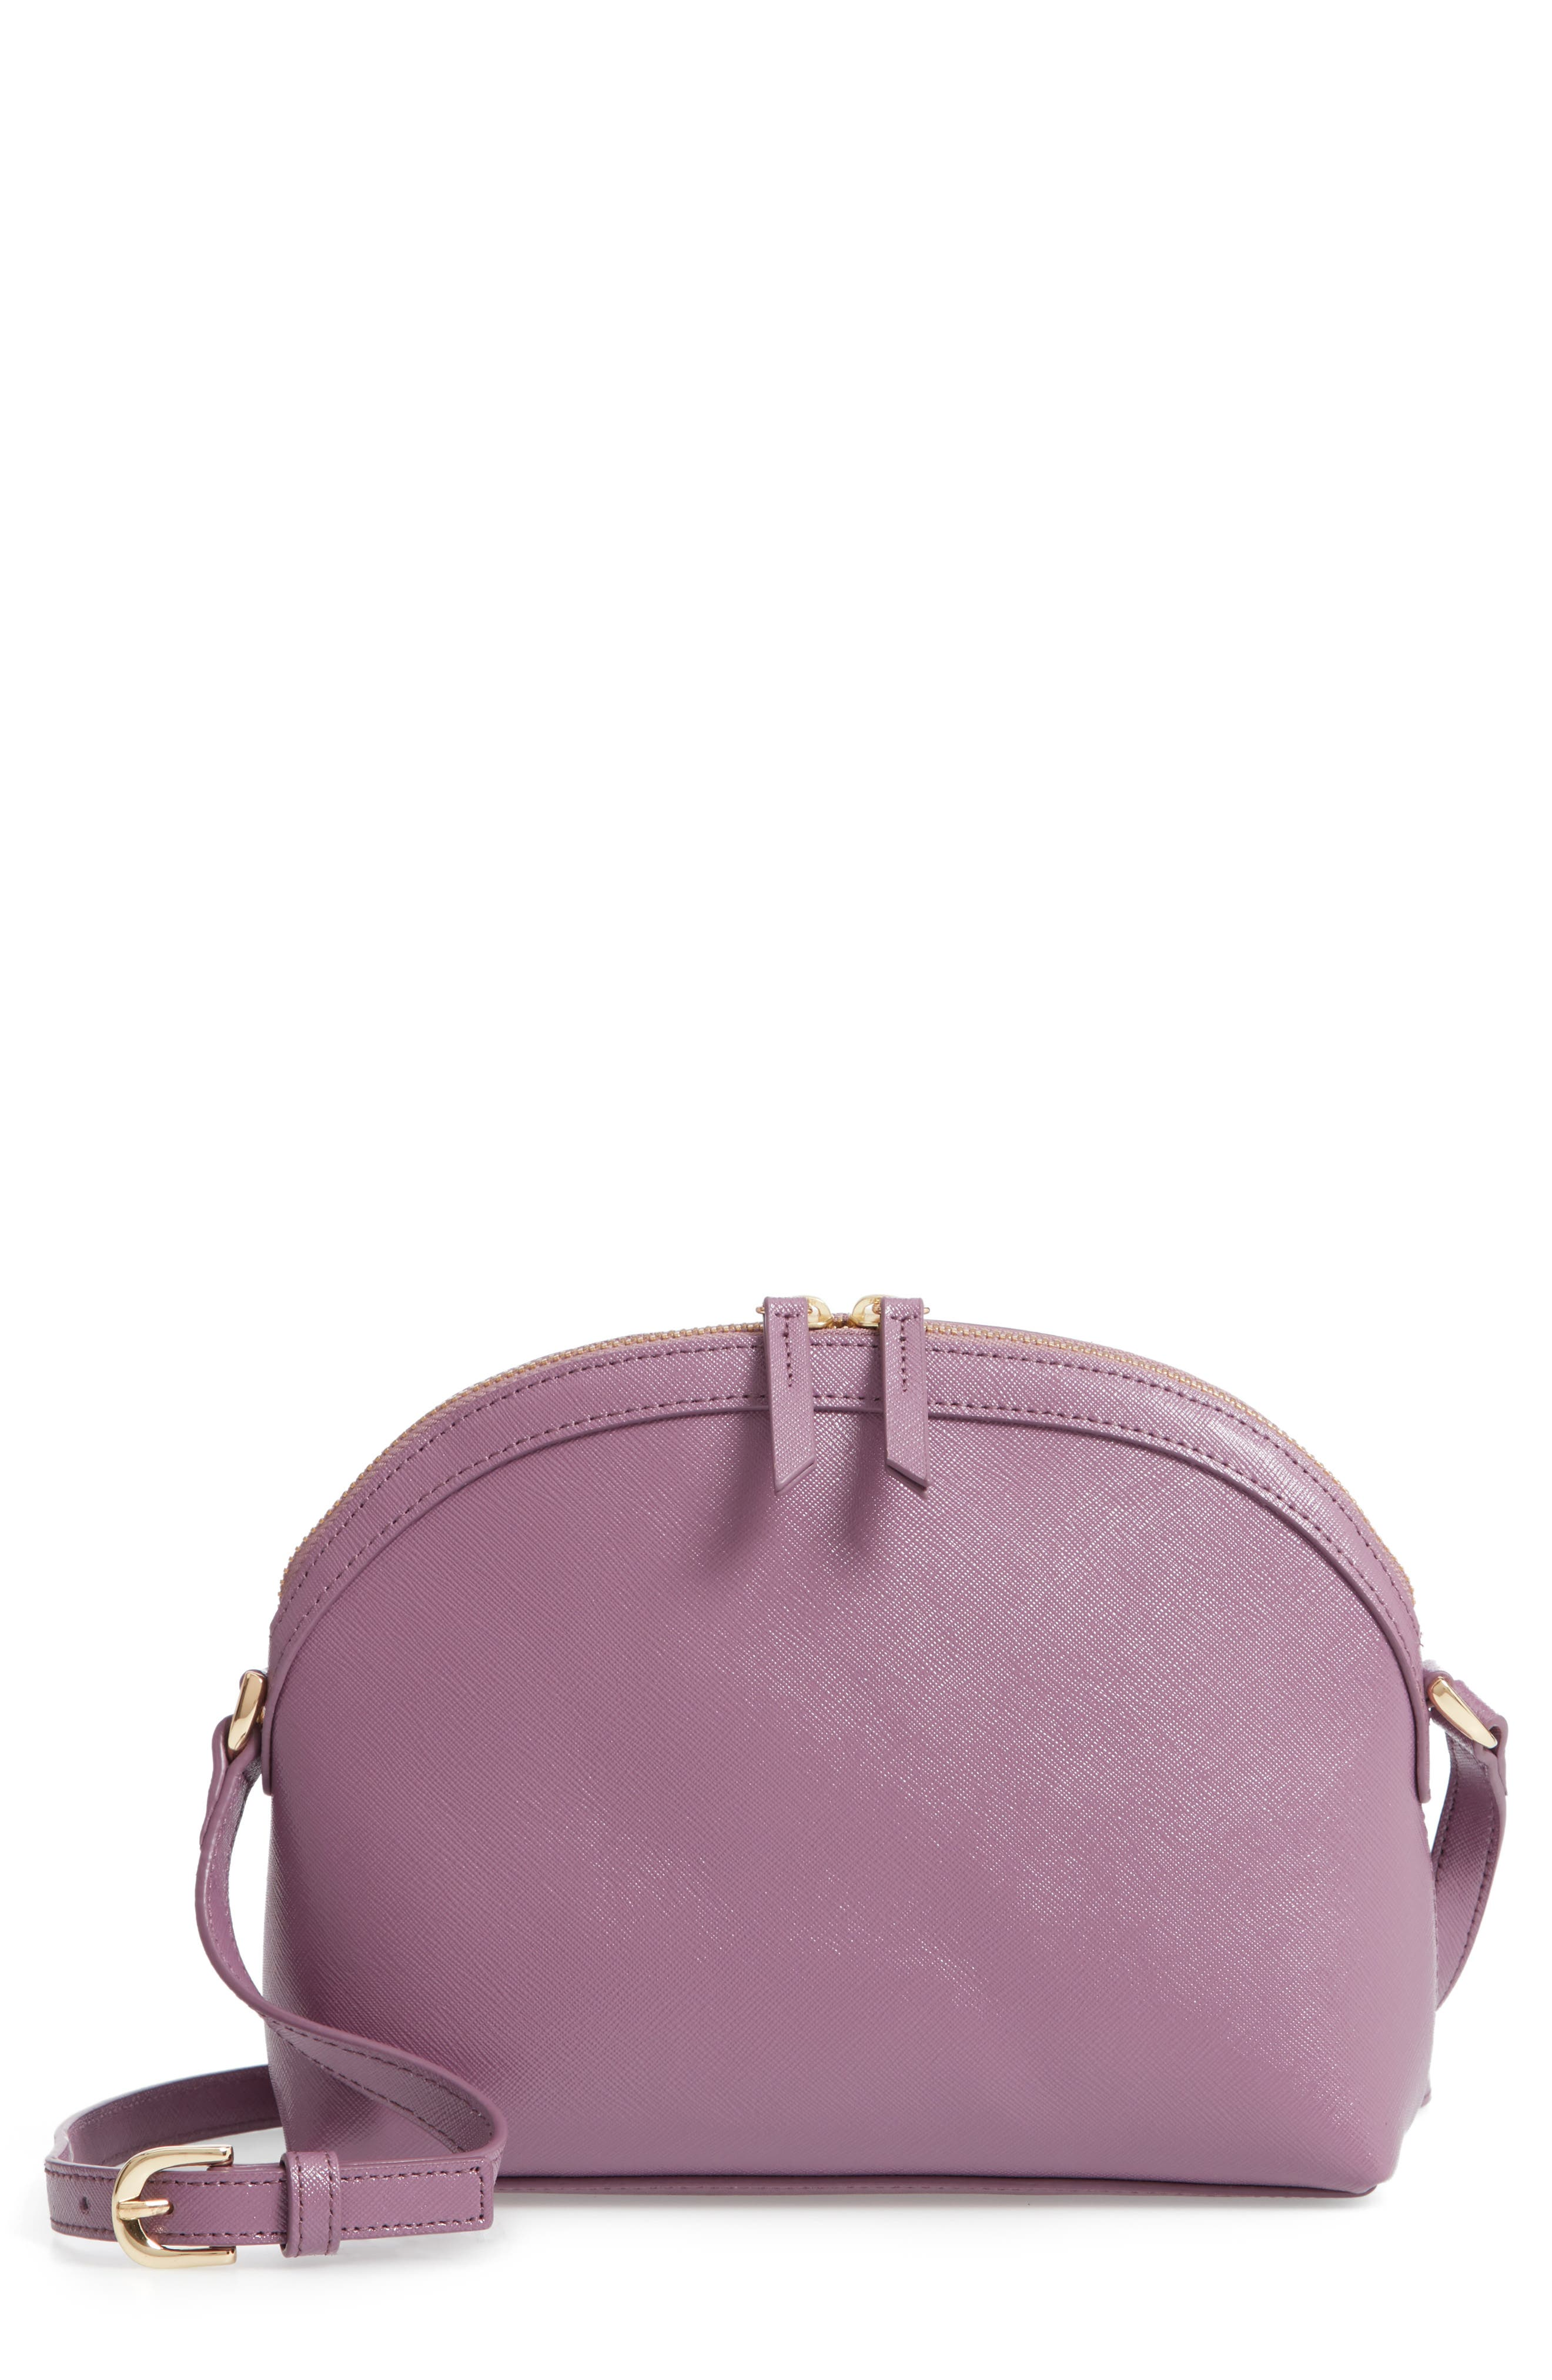 Isobel Half Moon Leather Crossbody Bag,                         Main,                         color, PURPLE BETTA